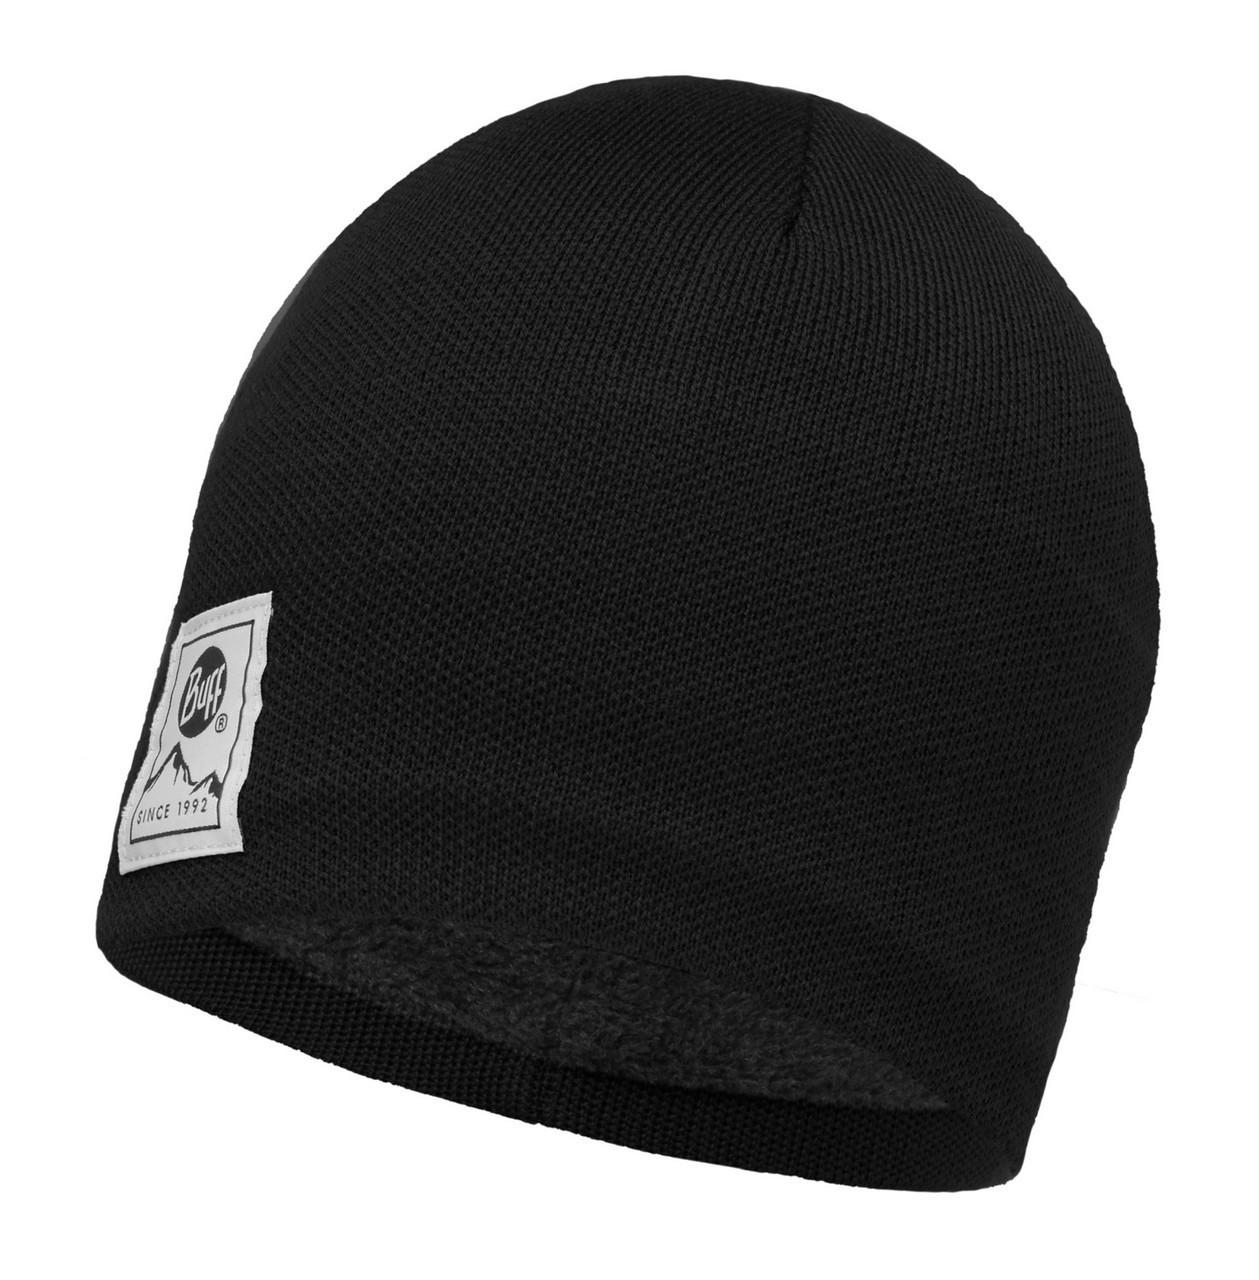 Шапки средней вязки Вязаная шапка с флисовой подкладкой Buff Solid Black 113519.999.10.00.jpg